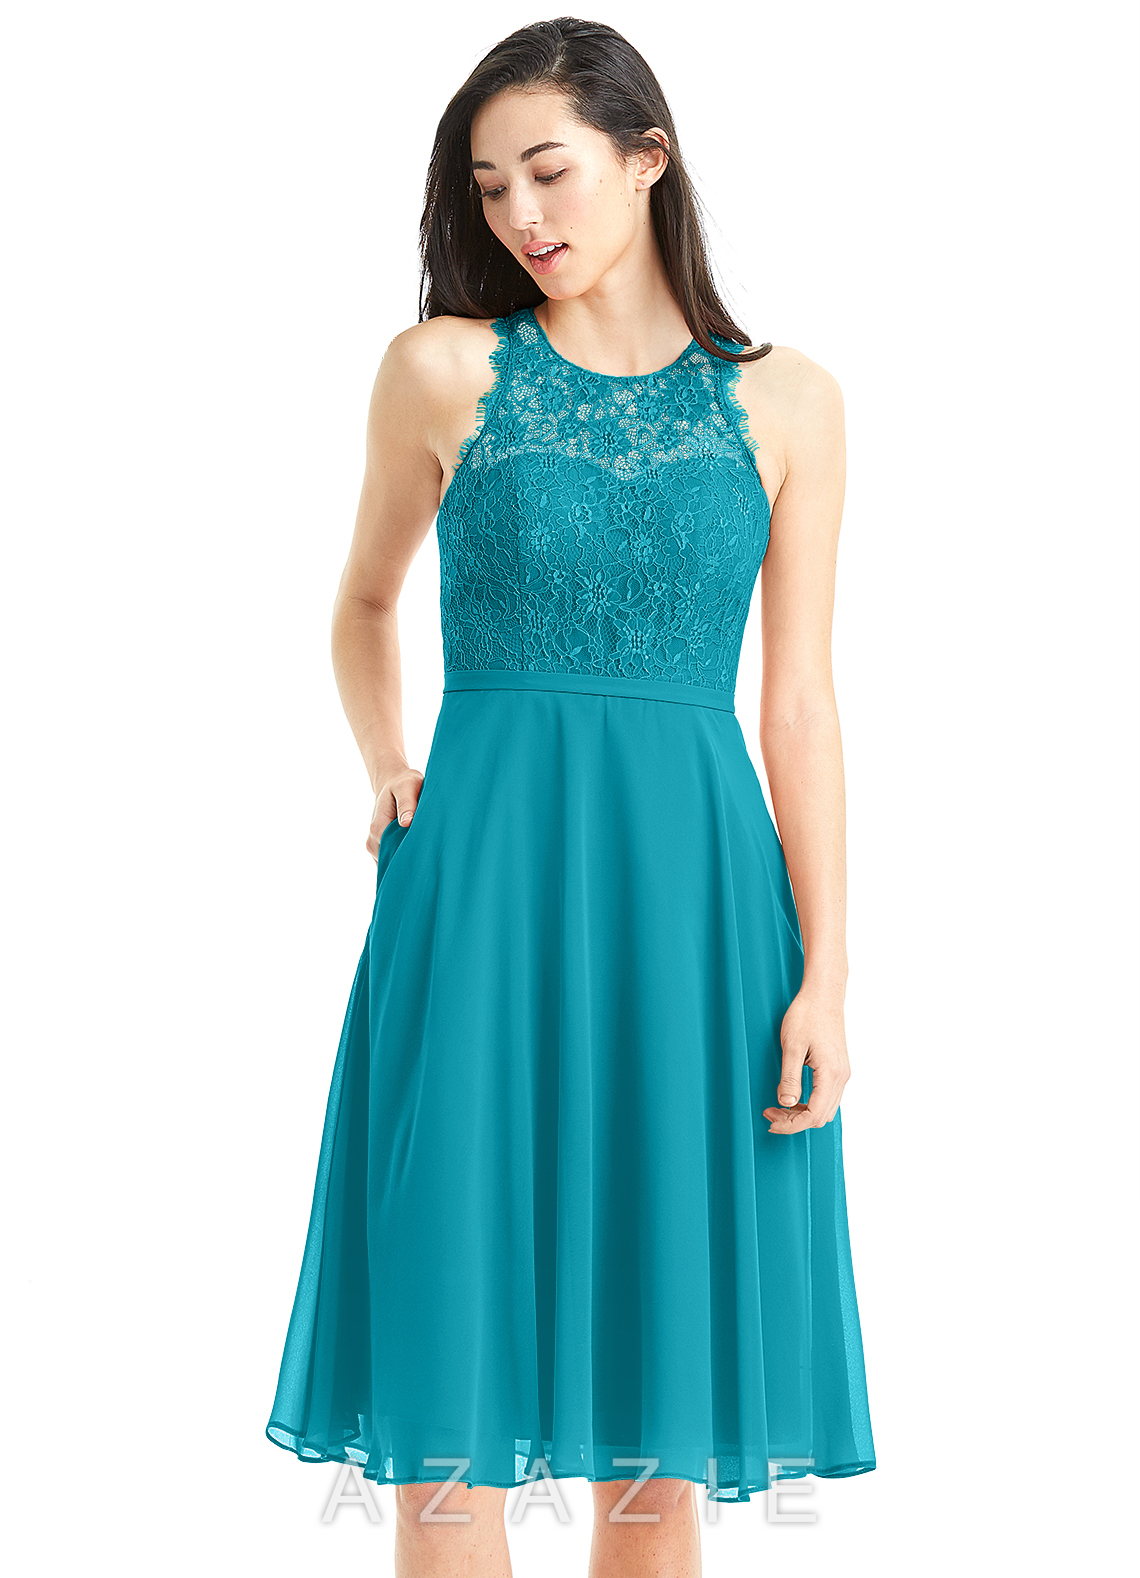 daa23159167 Azazie Sylvia Bridesmaid Dress - Jade